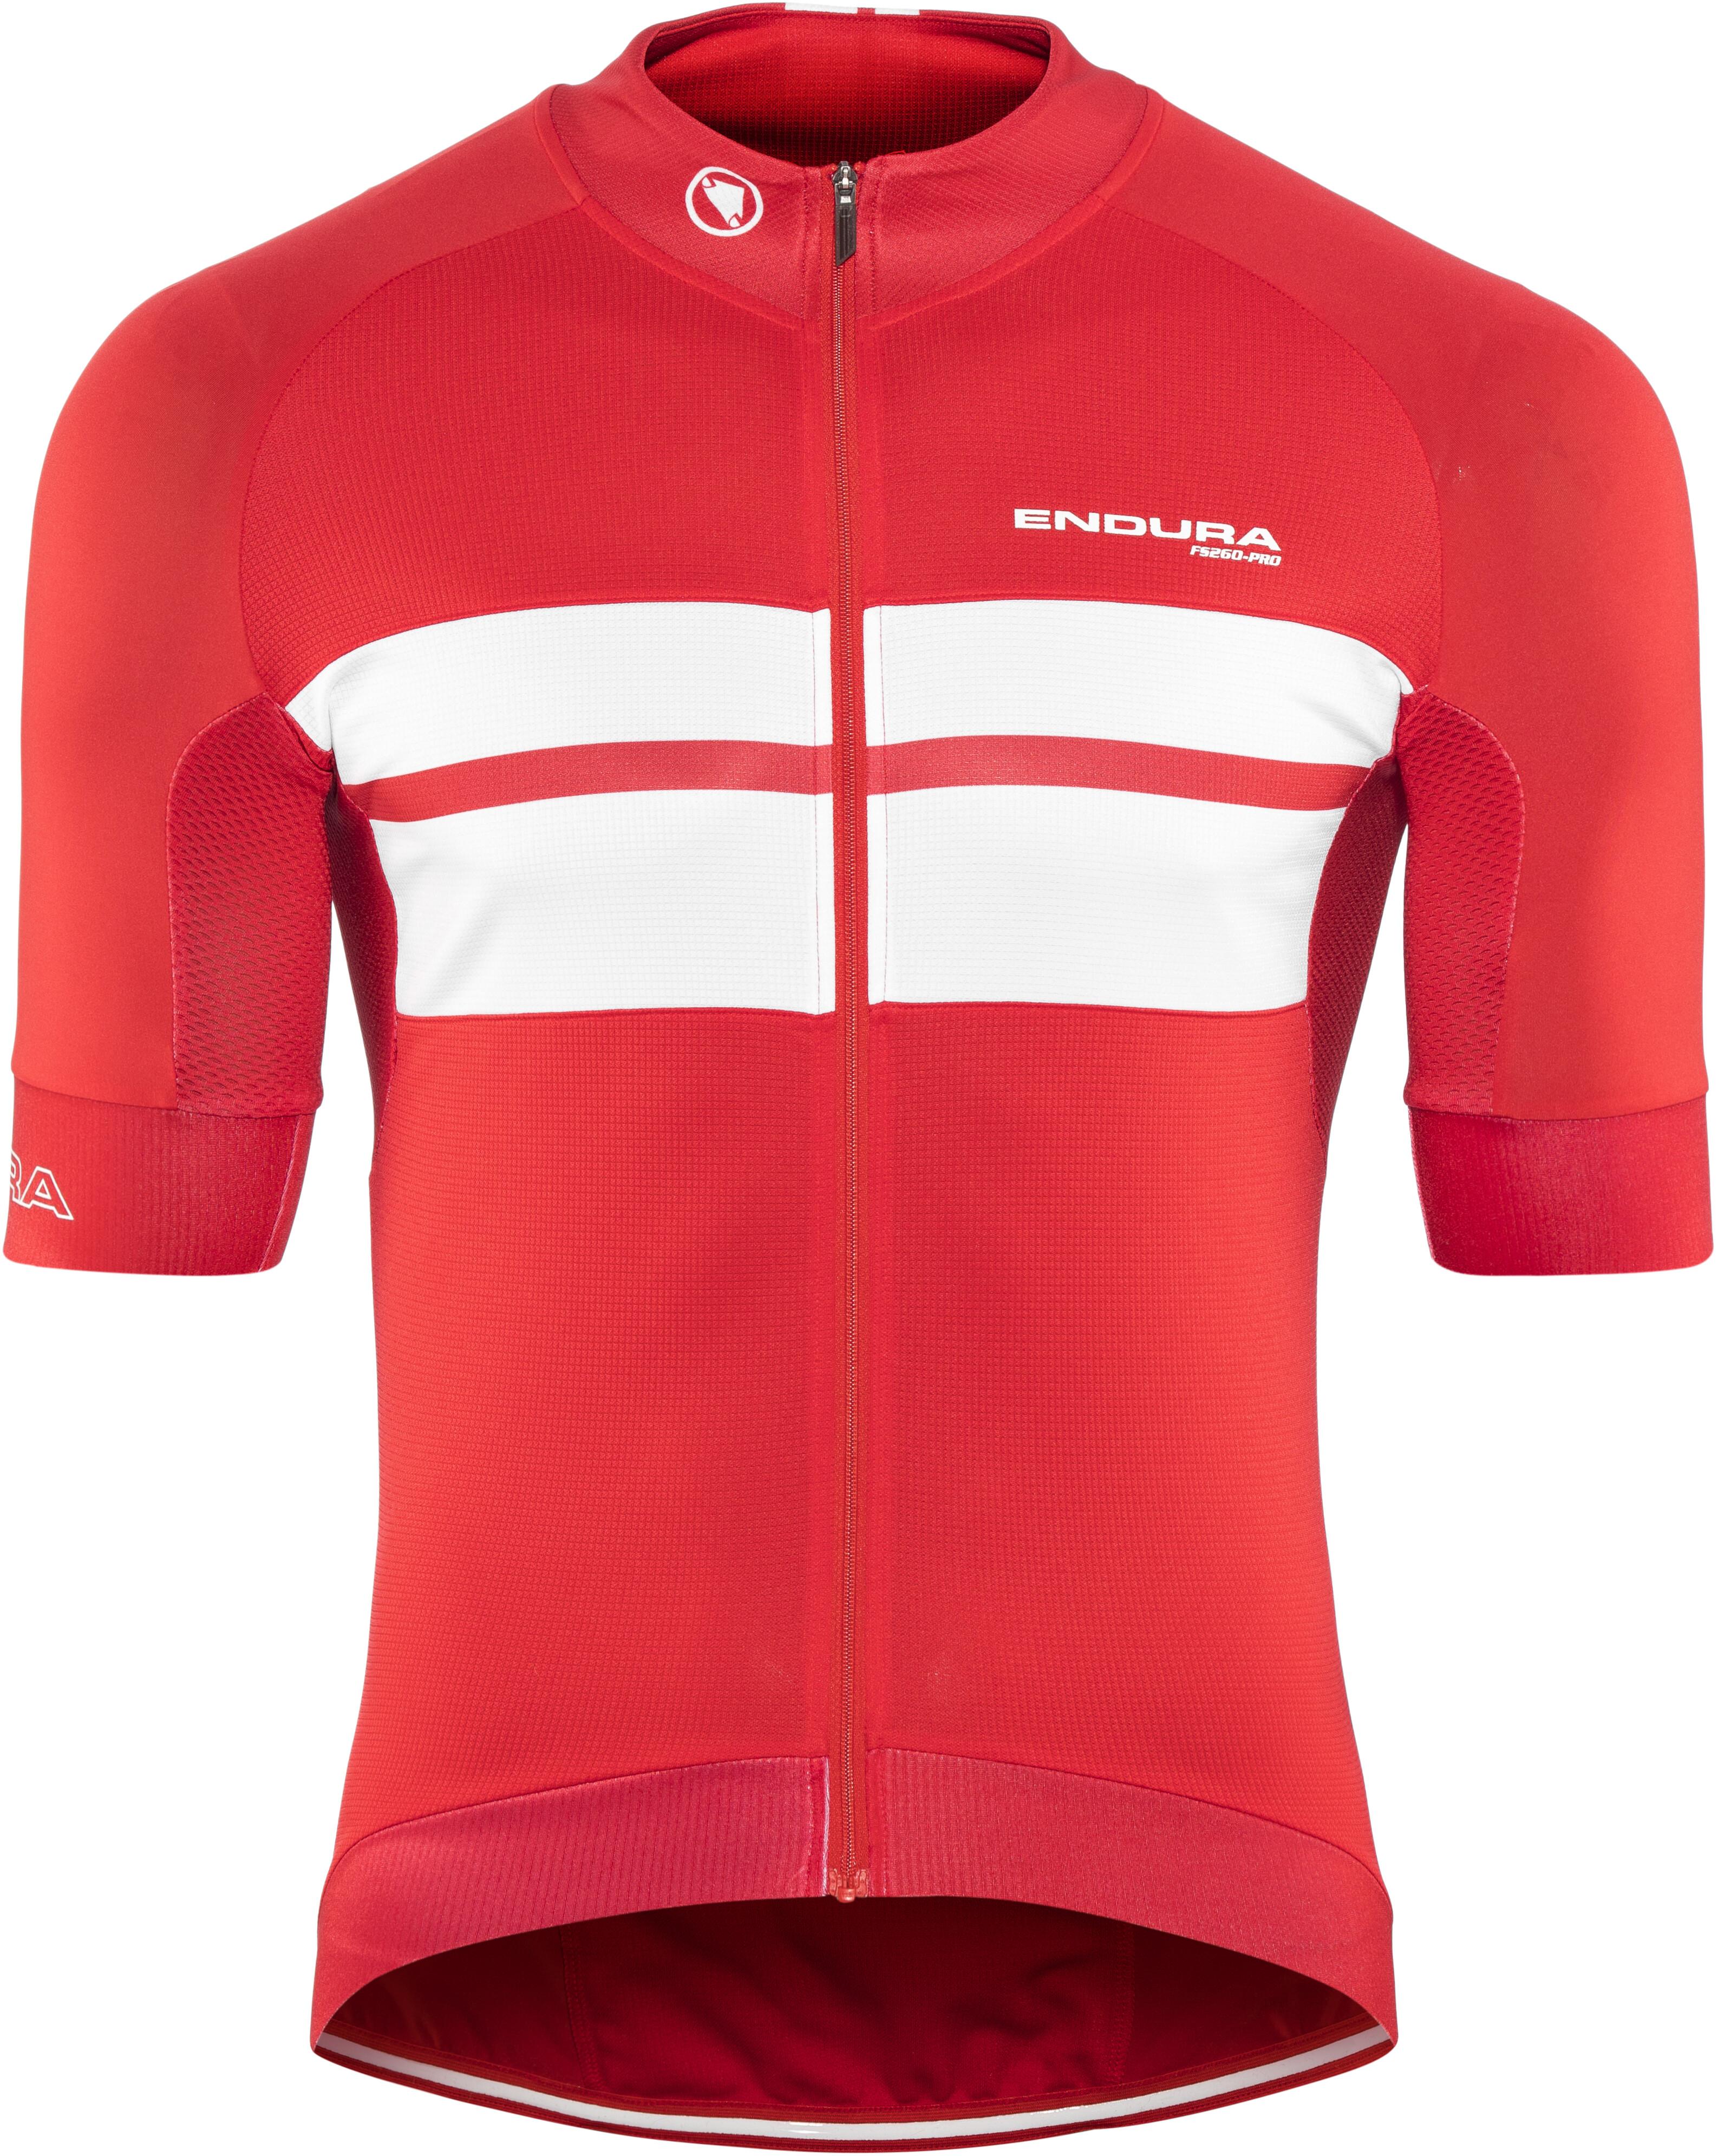 Endura FS260-Pro Bike Jersey Shortsleeve Men red white at Bikester.co.uk c91c42cab